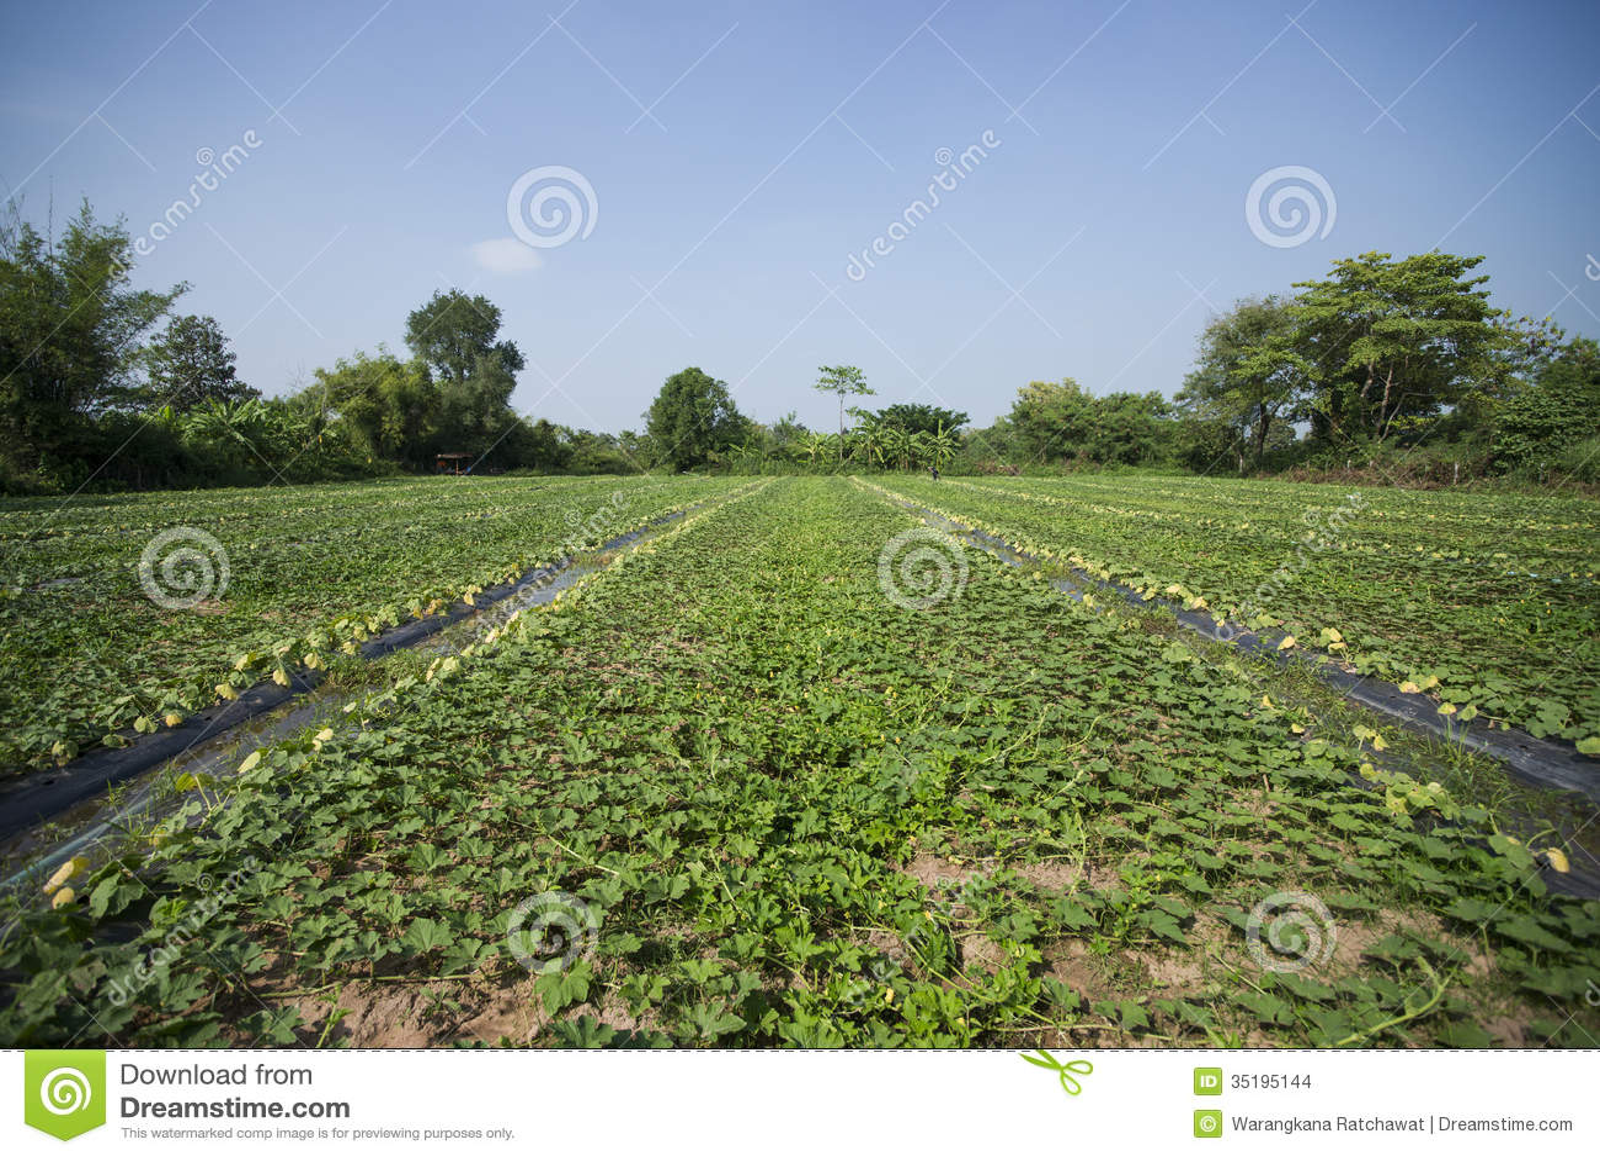 Watermelon Plant Farming | Cultivation | Seeds Information | Profit